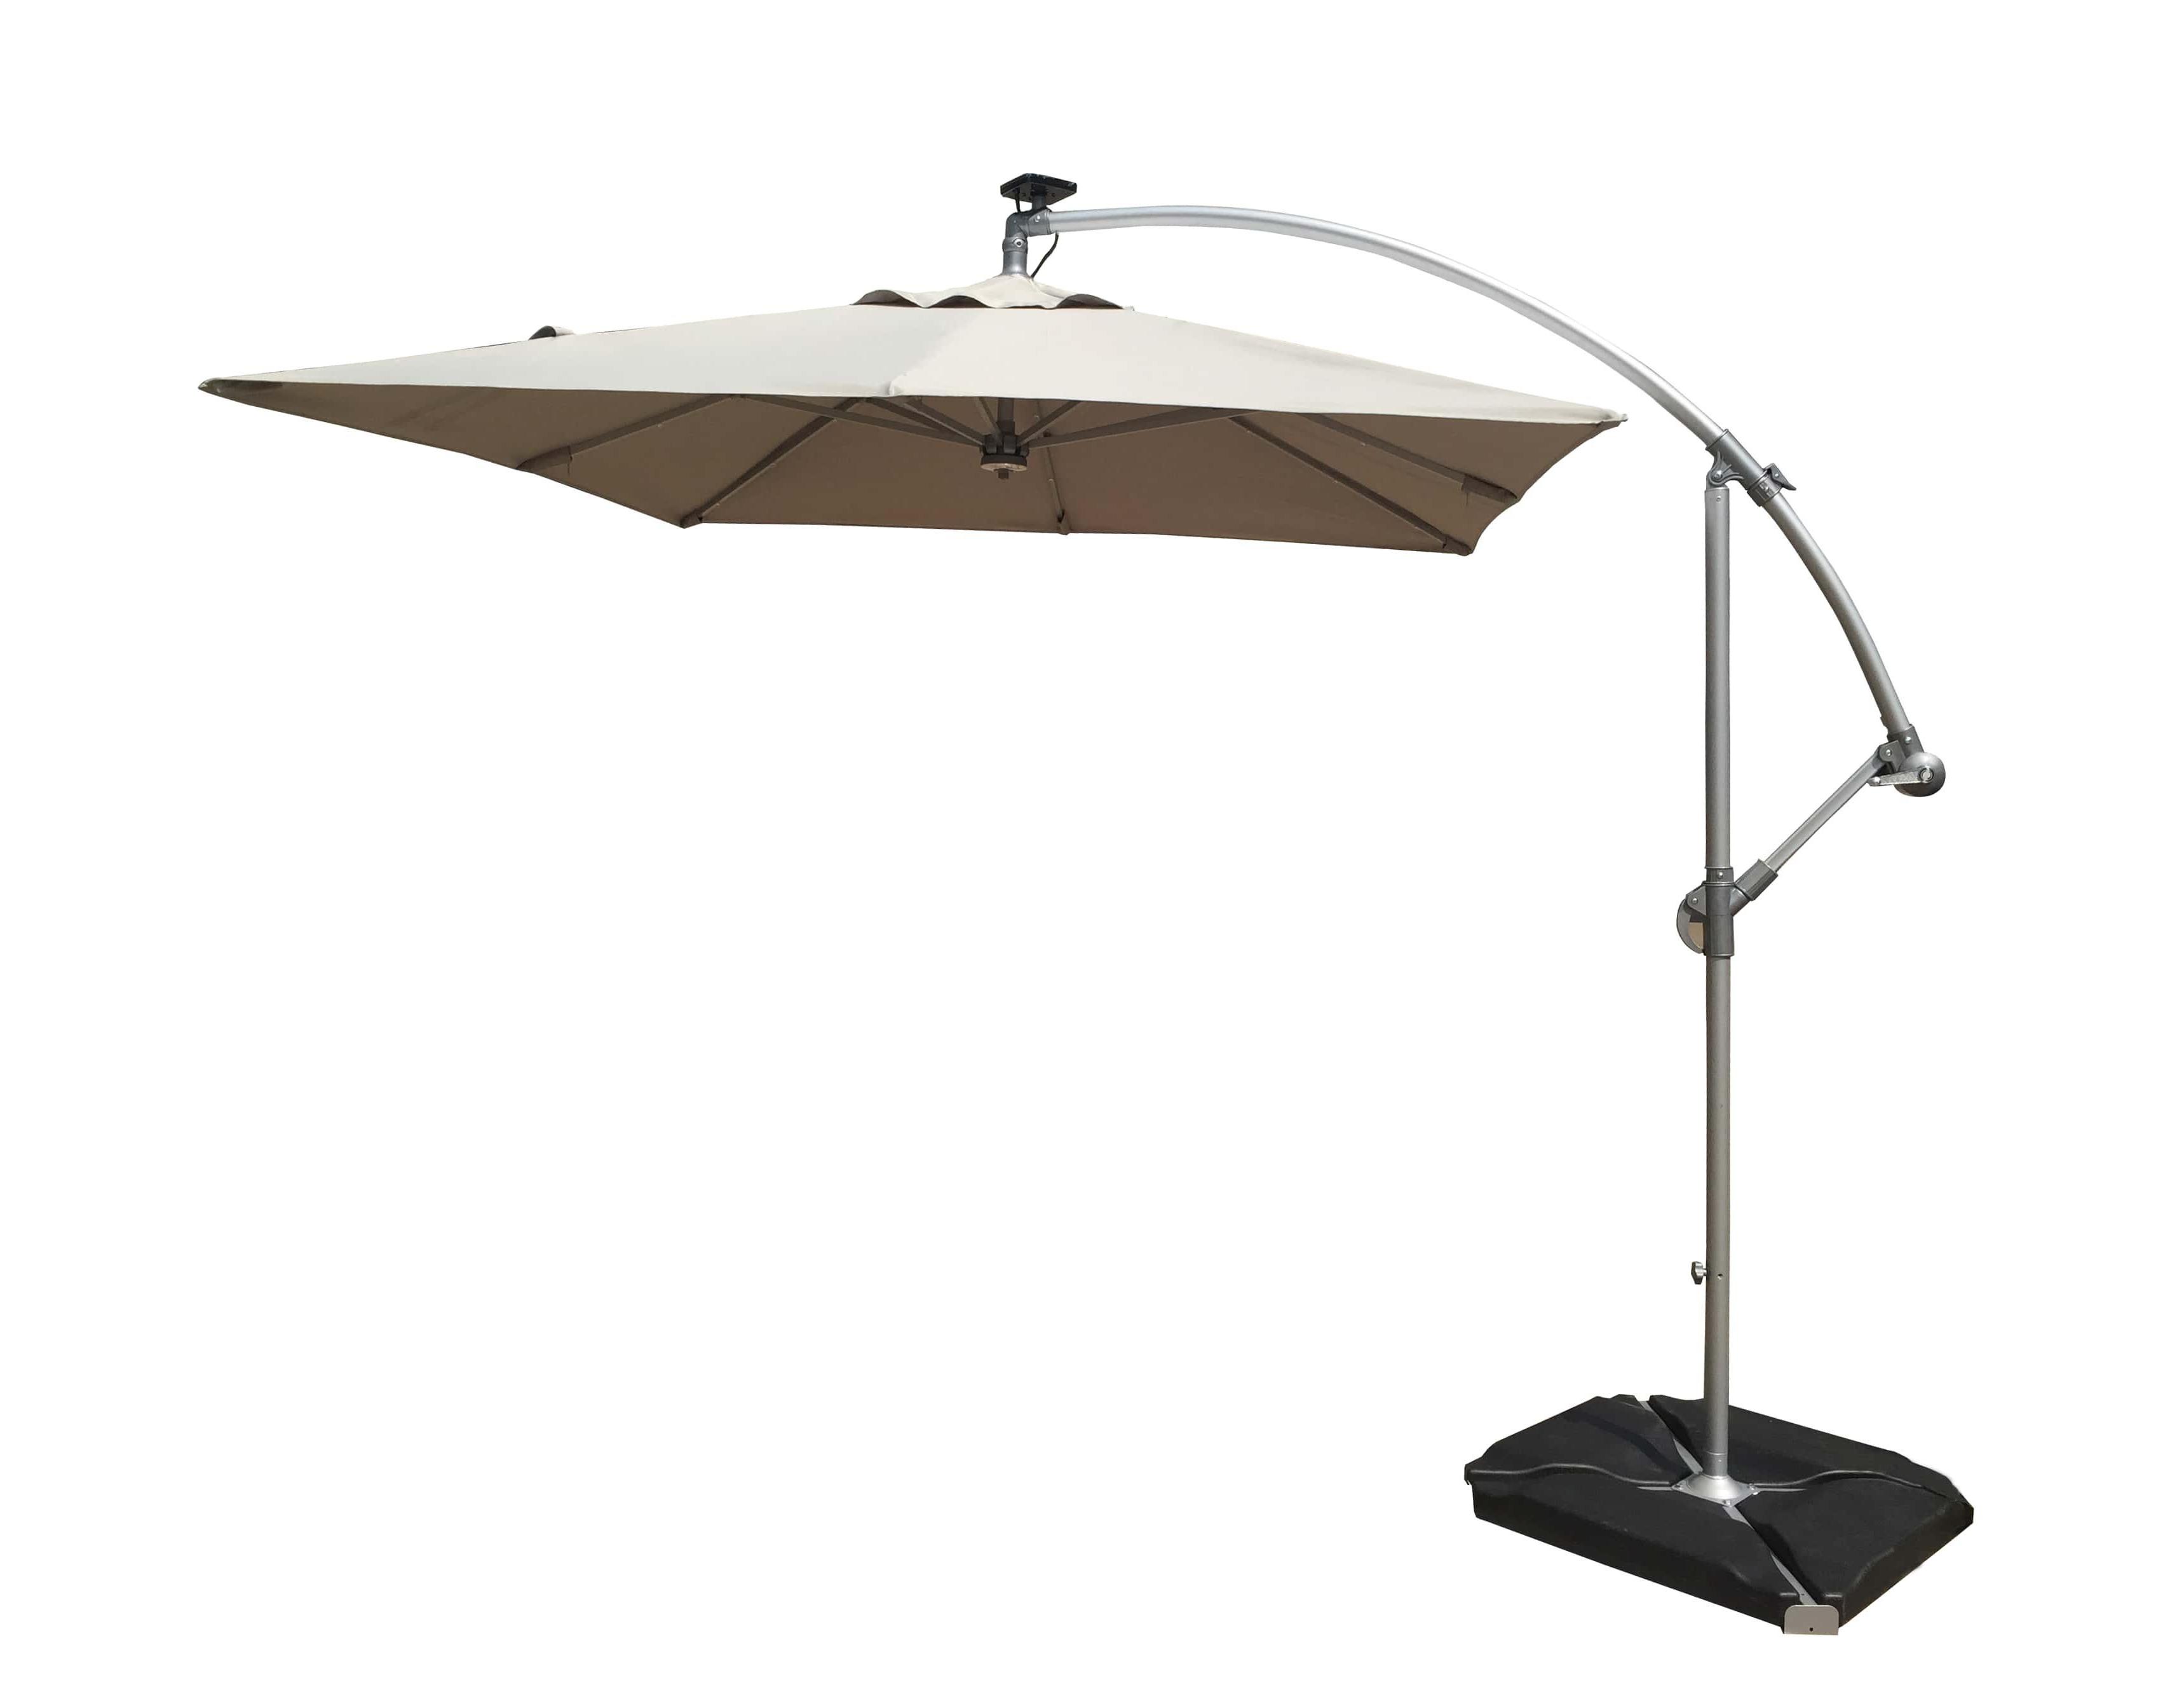 8' Cantilever Umbrella Throughout Favorite Fordwich Rectangular Cantilever Umbrellas (View 16 of 20)